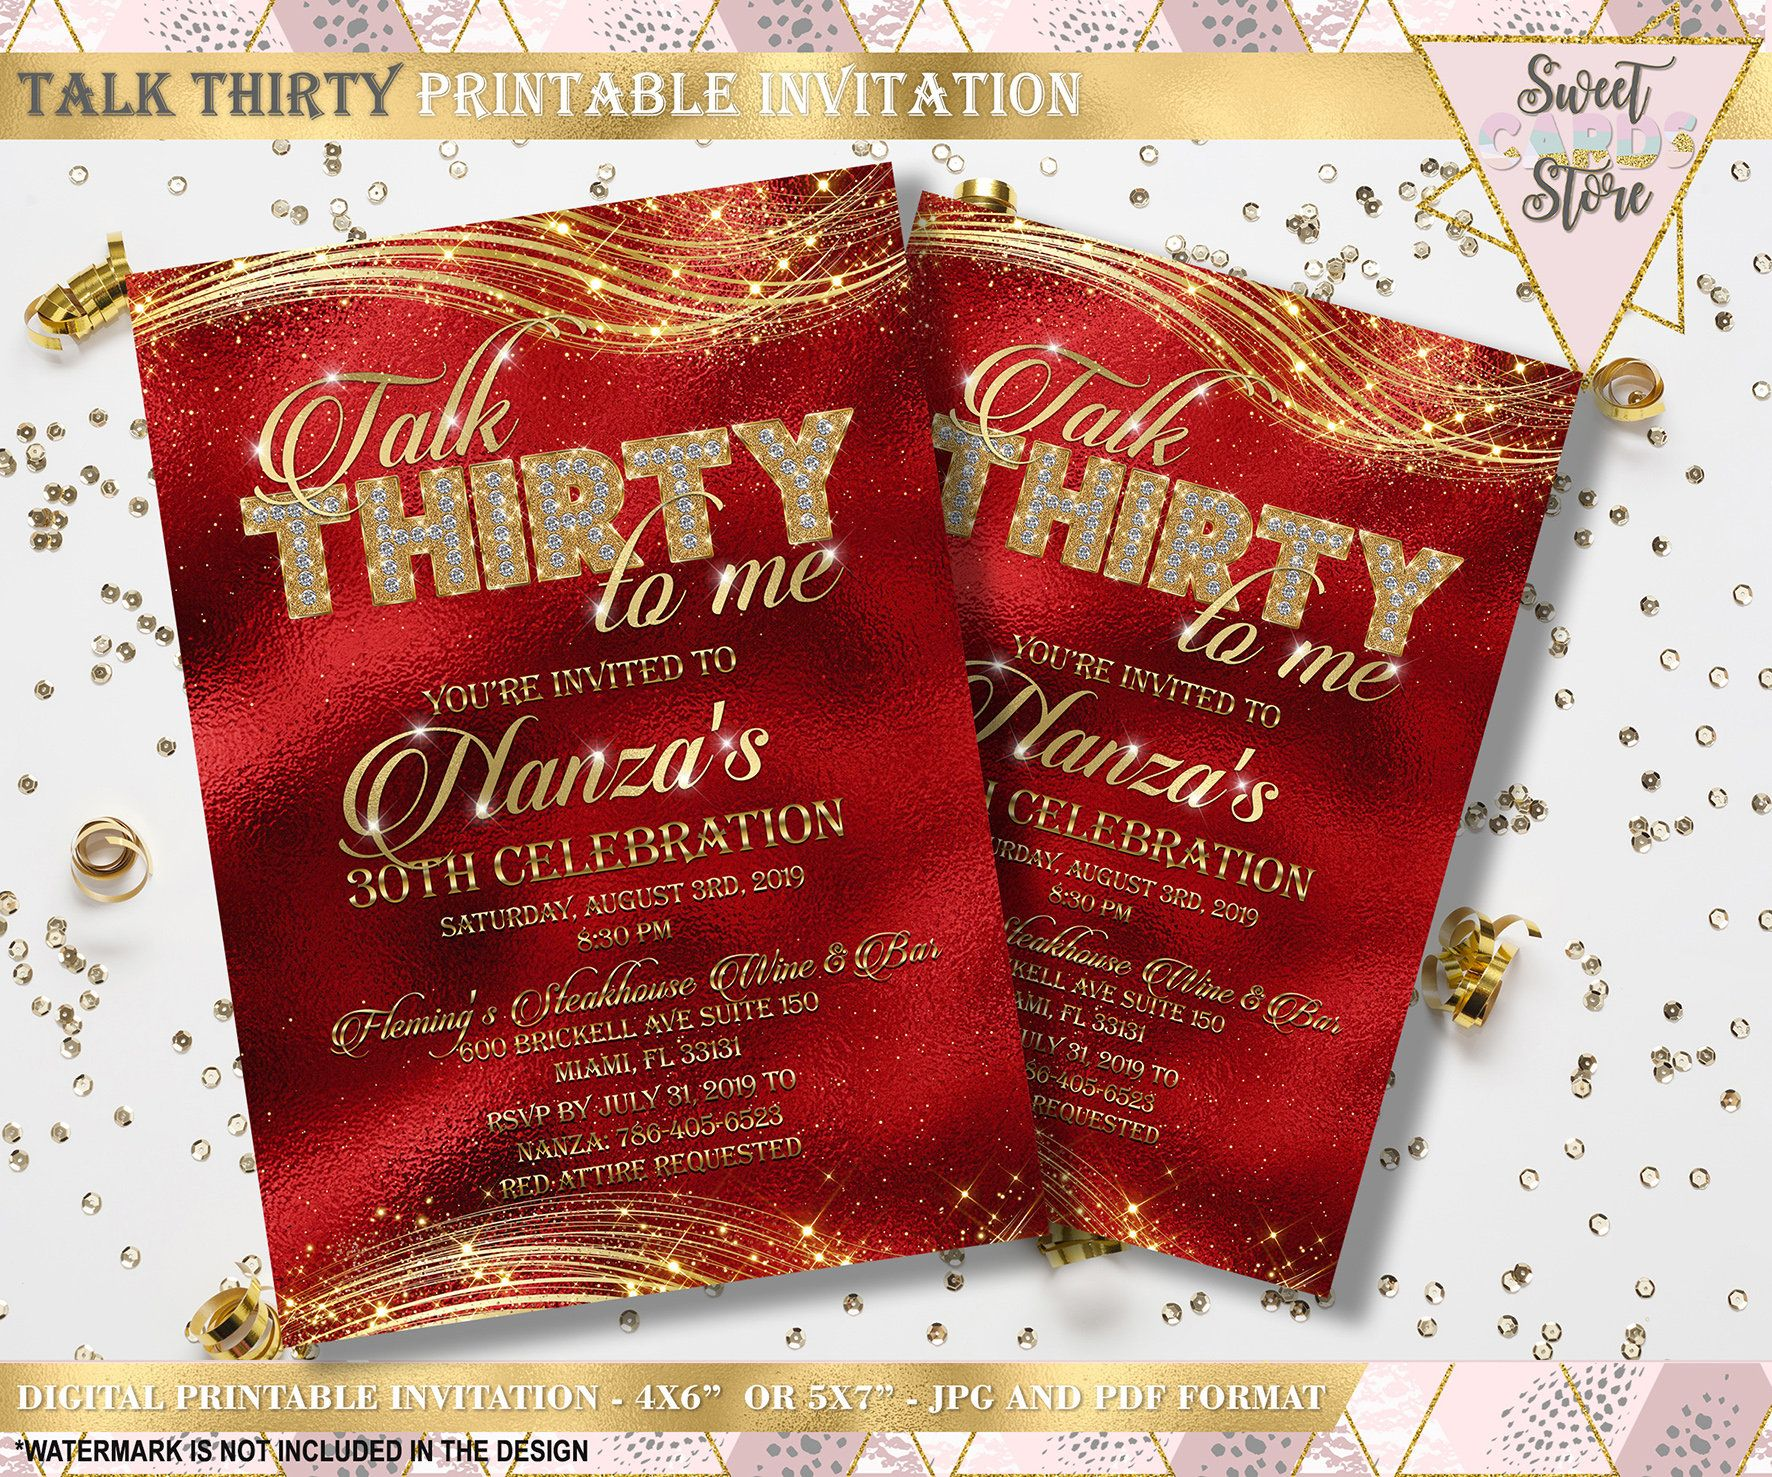 Talk Thirty To Me Printable Invitation 30th Birthday Etsy In 2020 Printable Invitations Glitter Invitations 30th Birthday Invitations